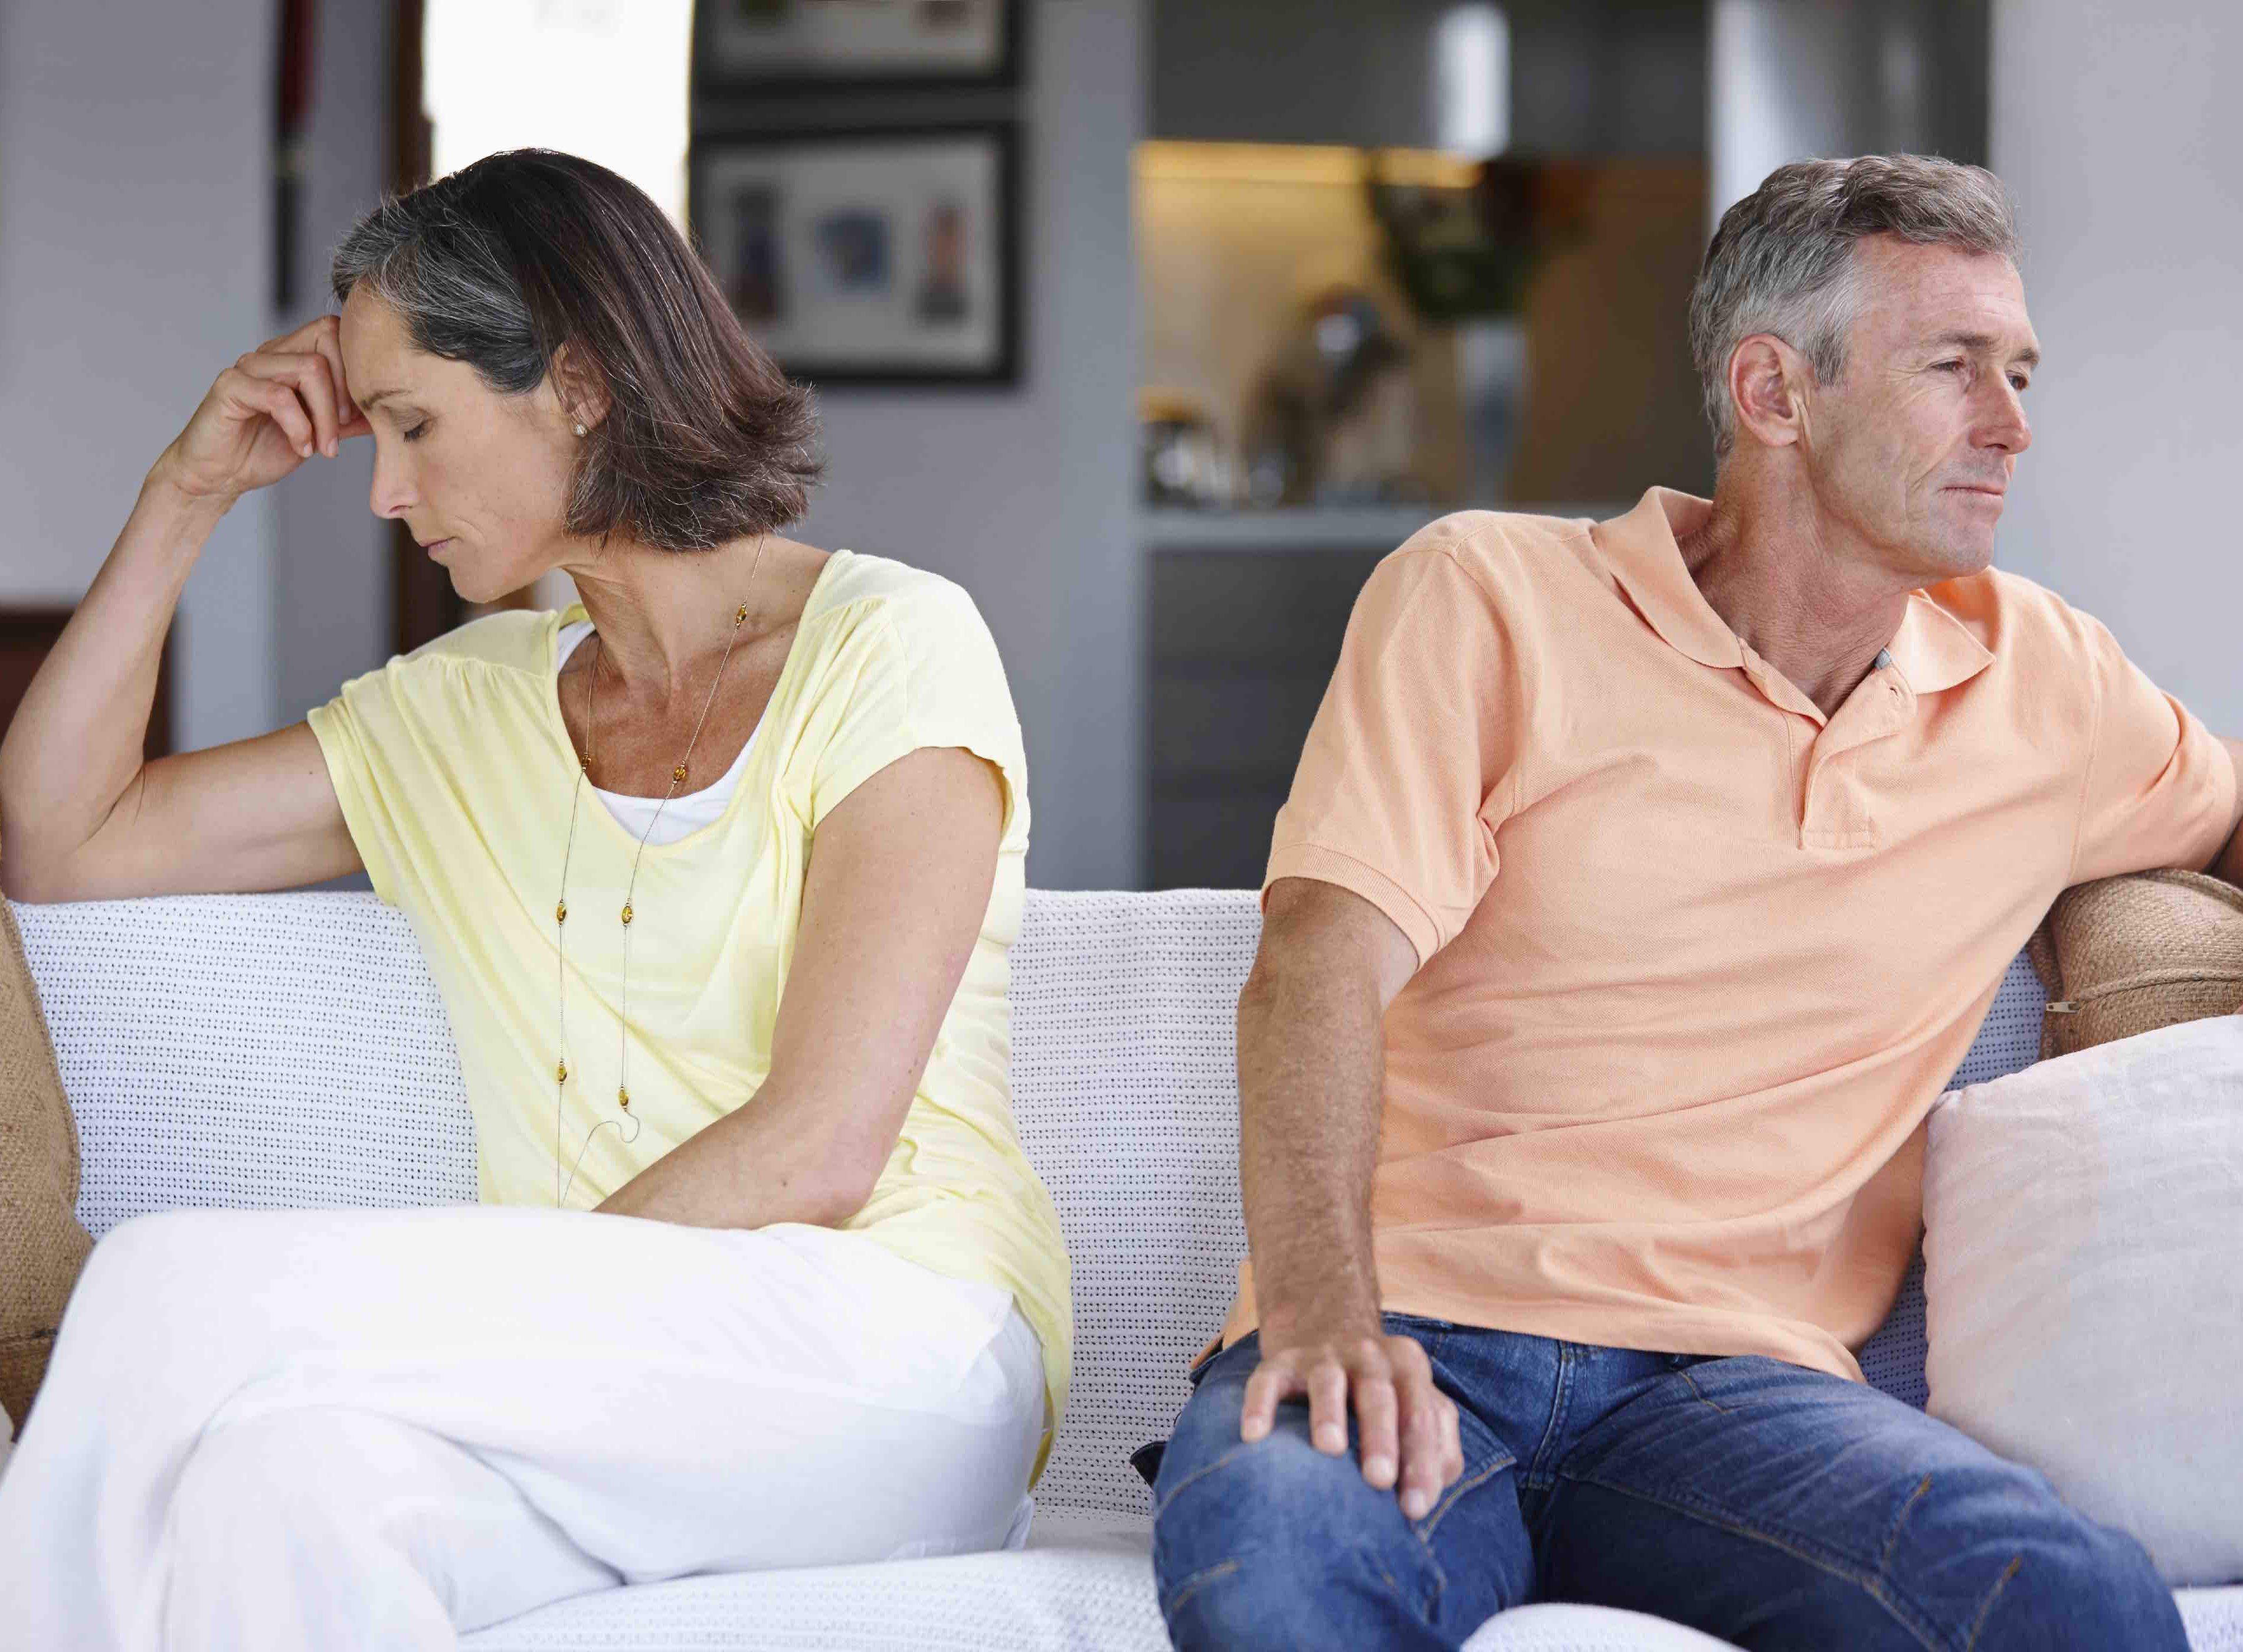 Cohabiting couple facing relationship breakdown